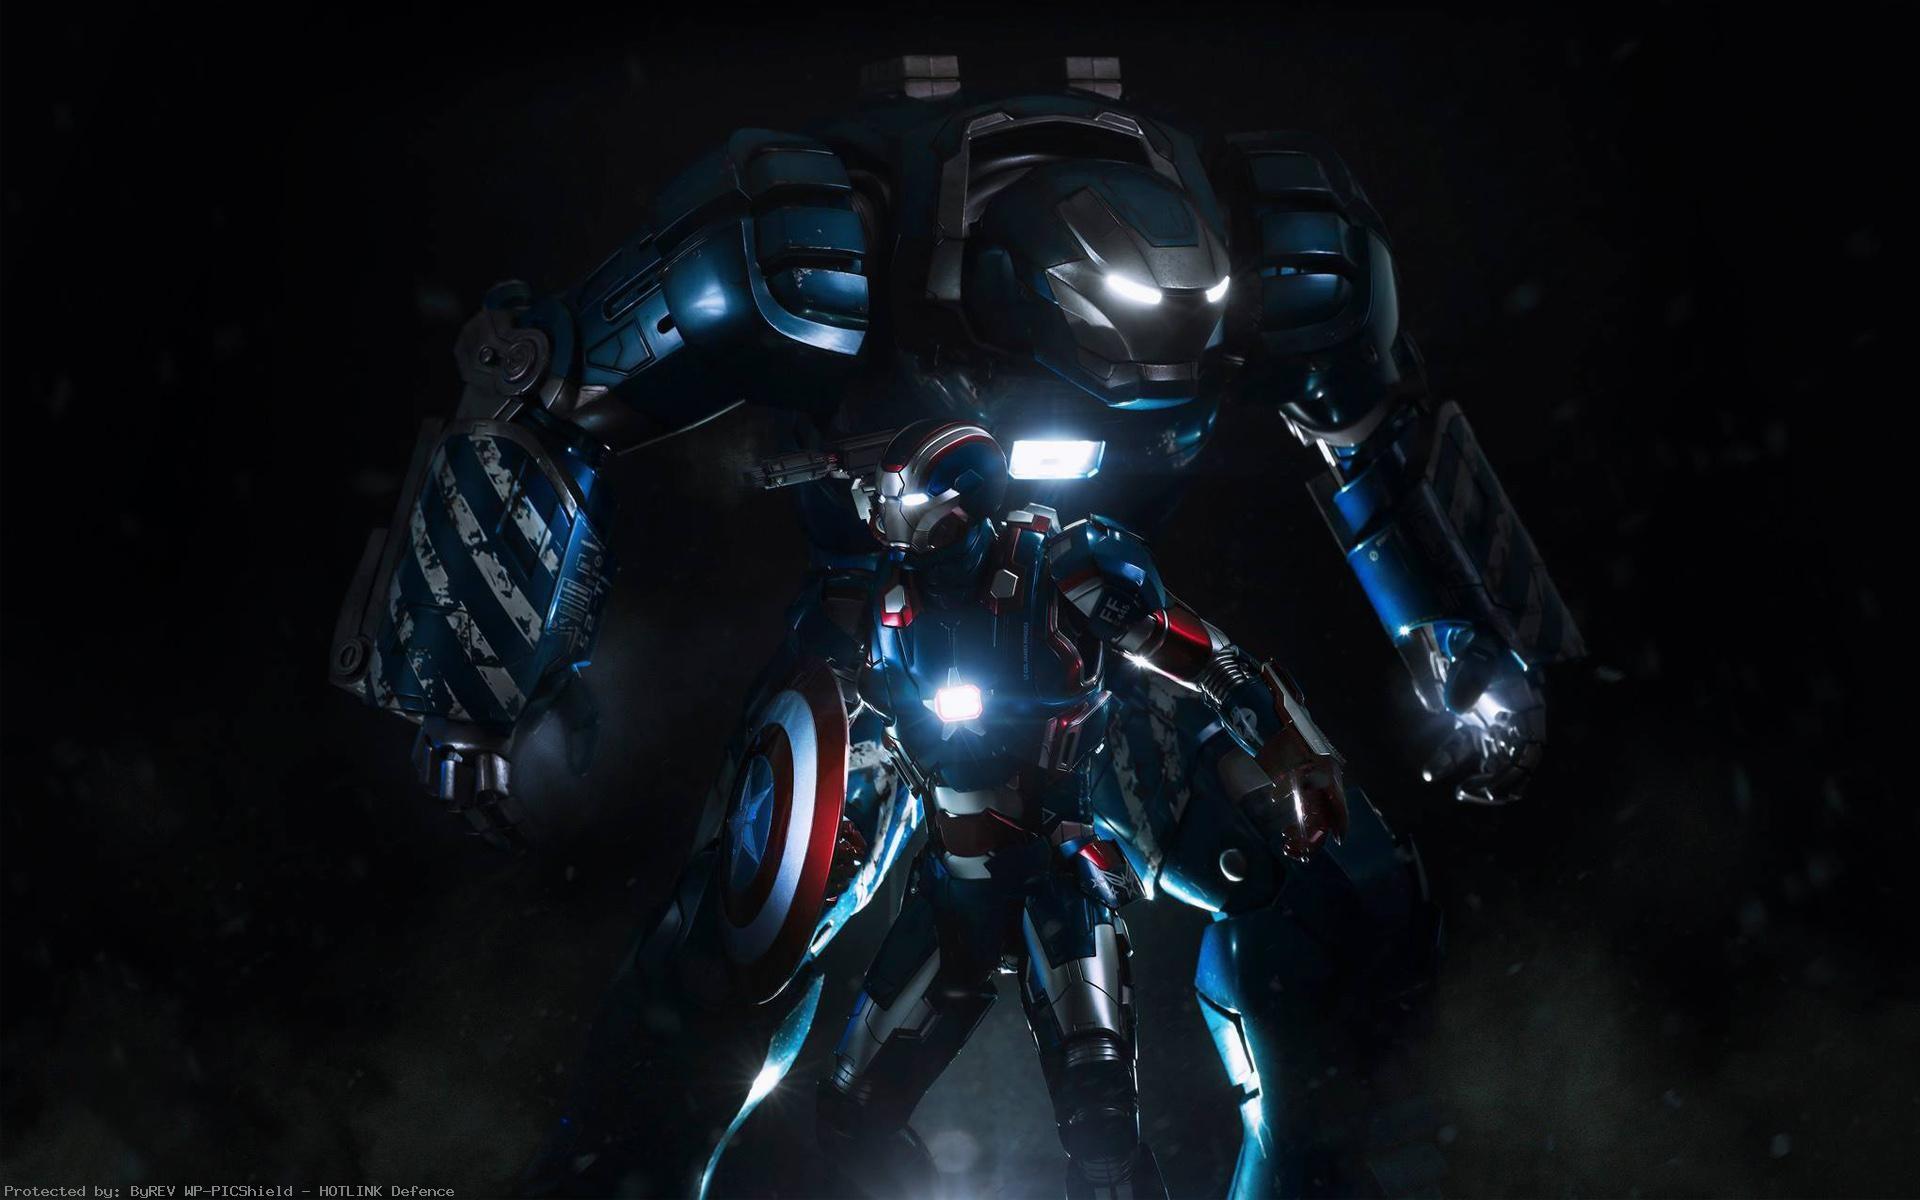 Iron-Man-Movie-s-HD-s-wallpaper-wpt1006228